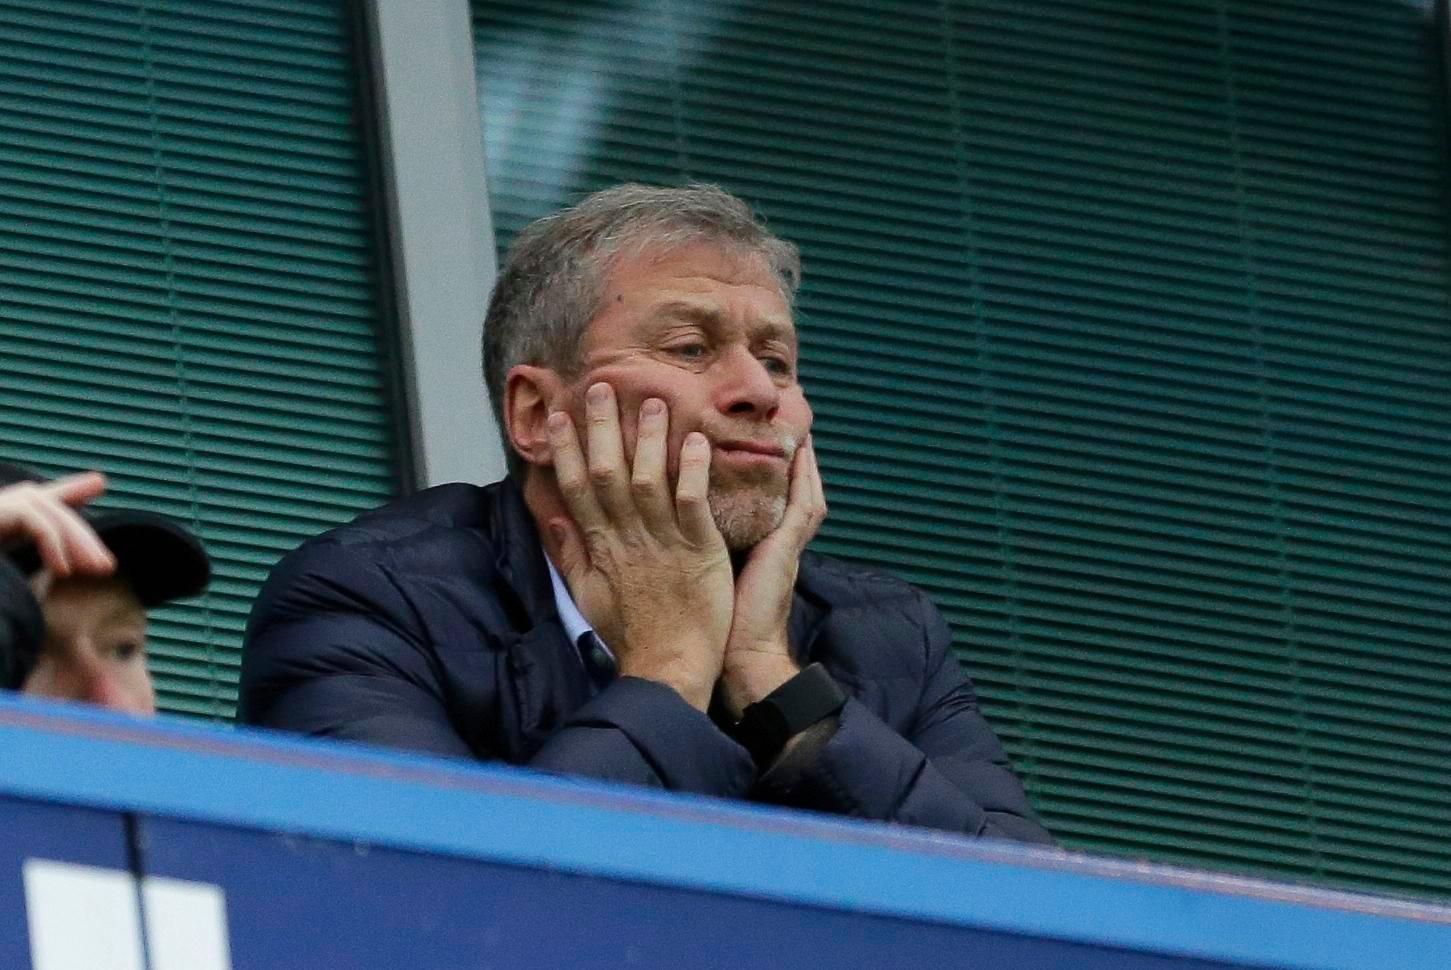 Chelsea owner Roman Abramovich is confident (Source: The Sun)